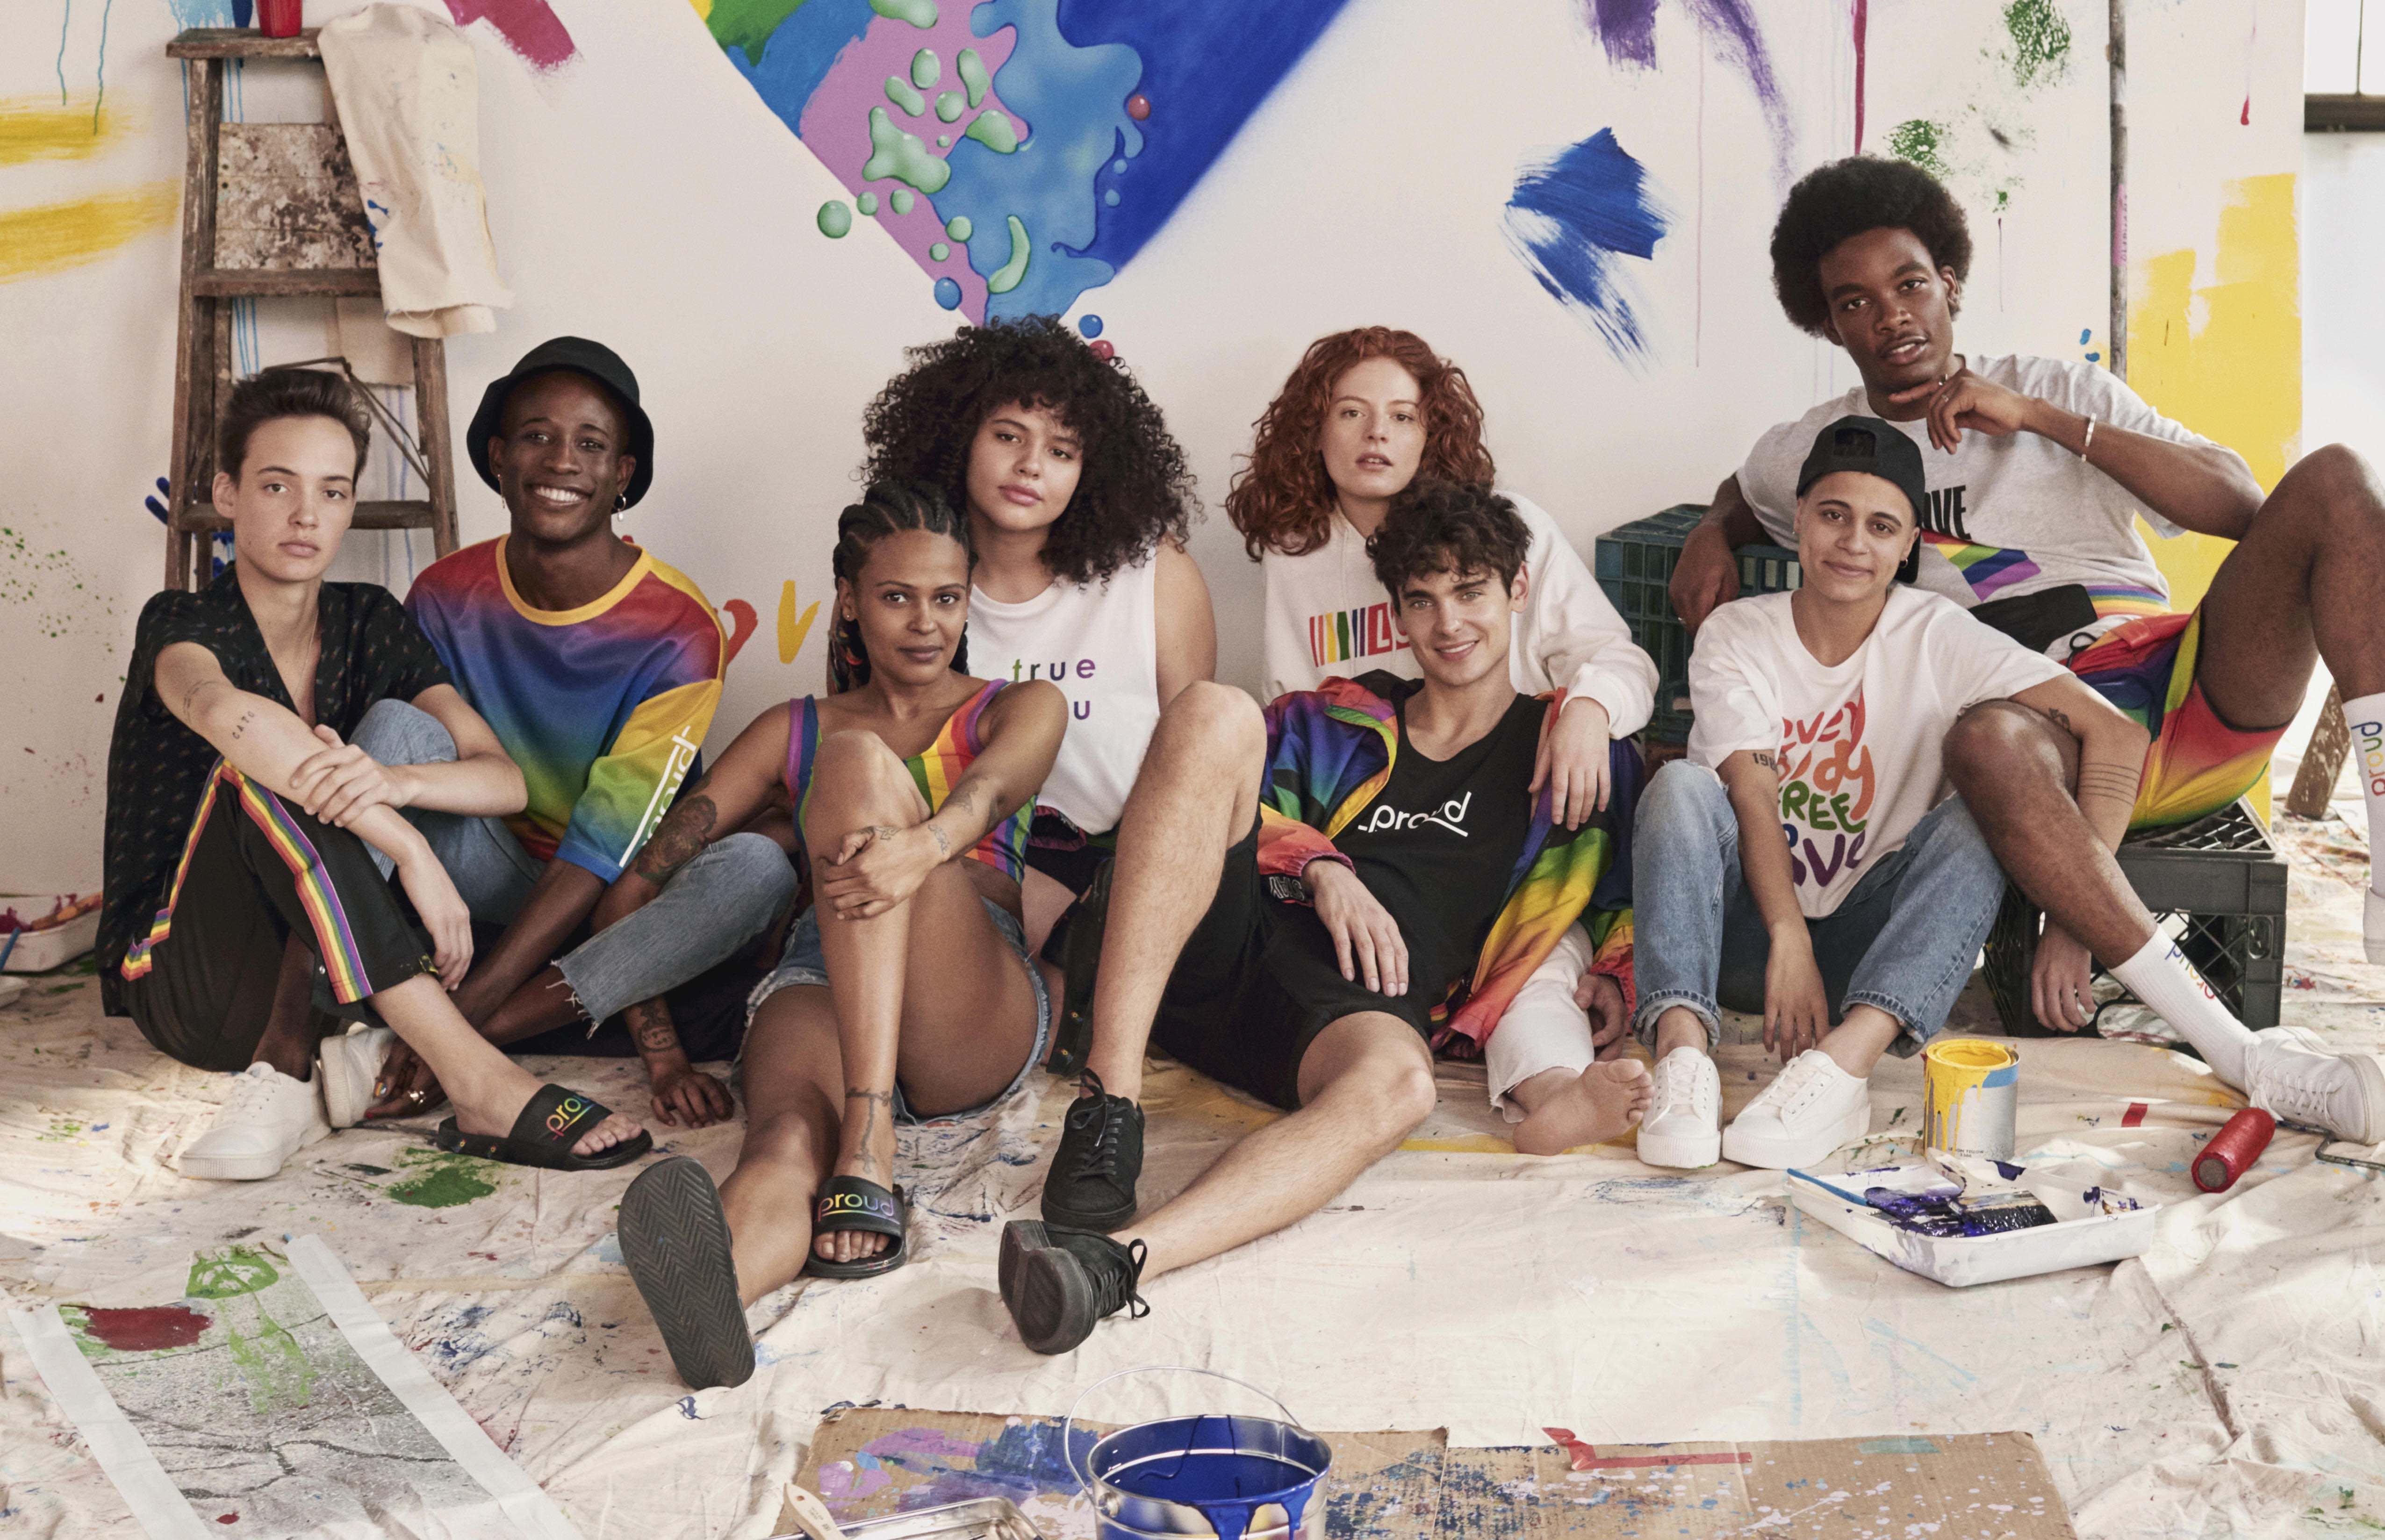 H&M, lighed, fællesskab, tøj, shopping, kollektion, lgbtqia